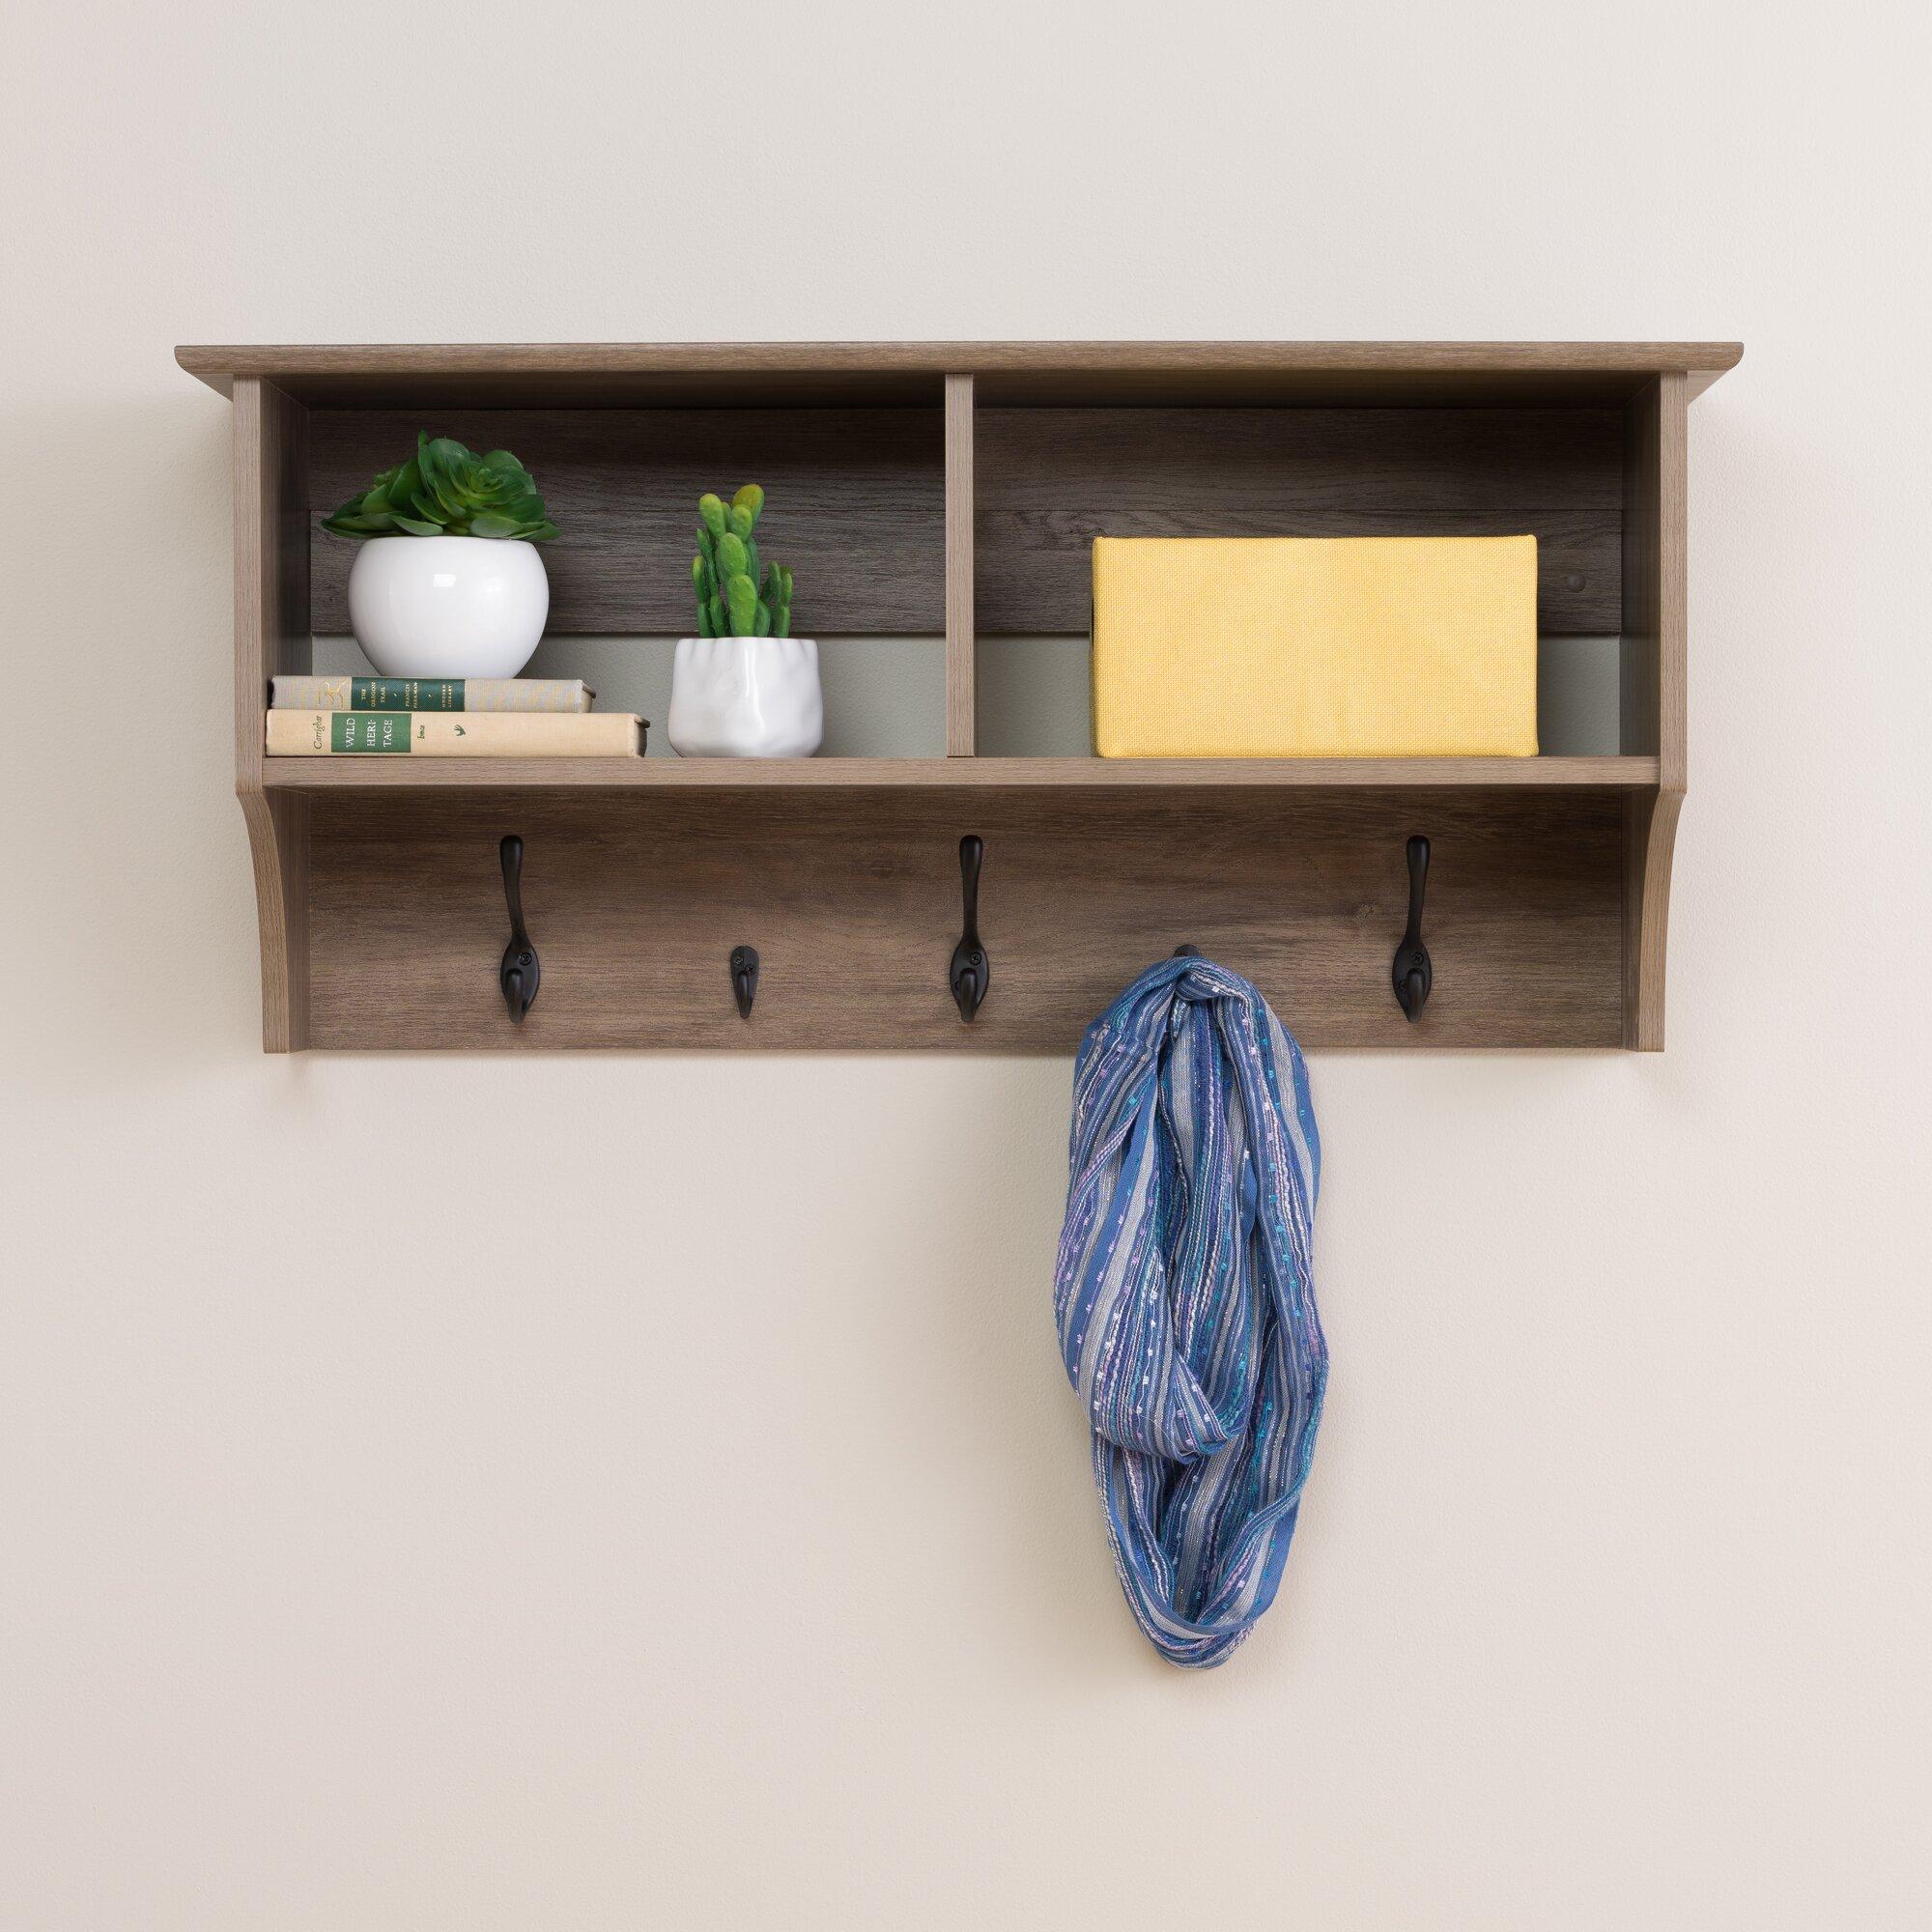 laurel foundry modern farmhouse 36 drifted gray wall mounted coat rack reviews wayfair. Black Bedroom Furniture Sets. Home Design Ideas